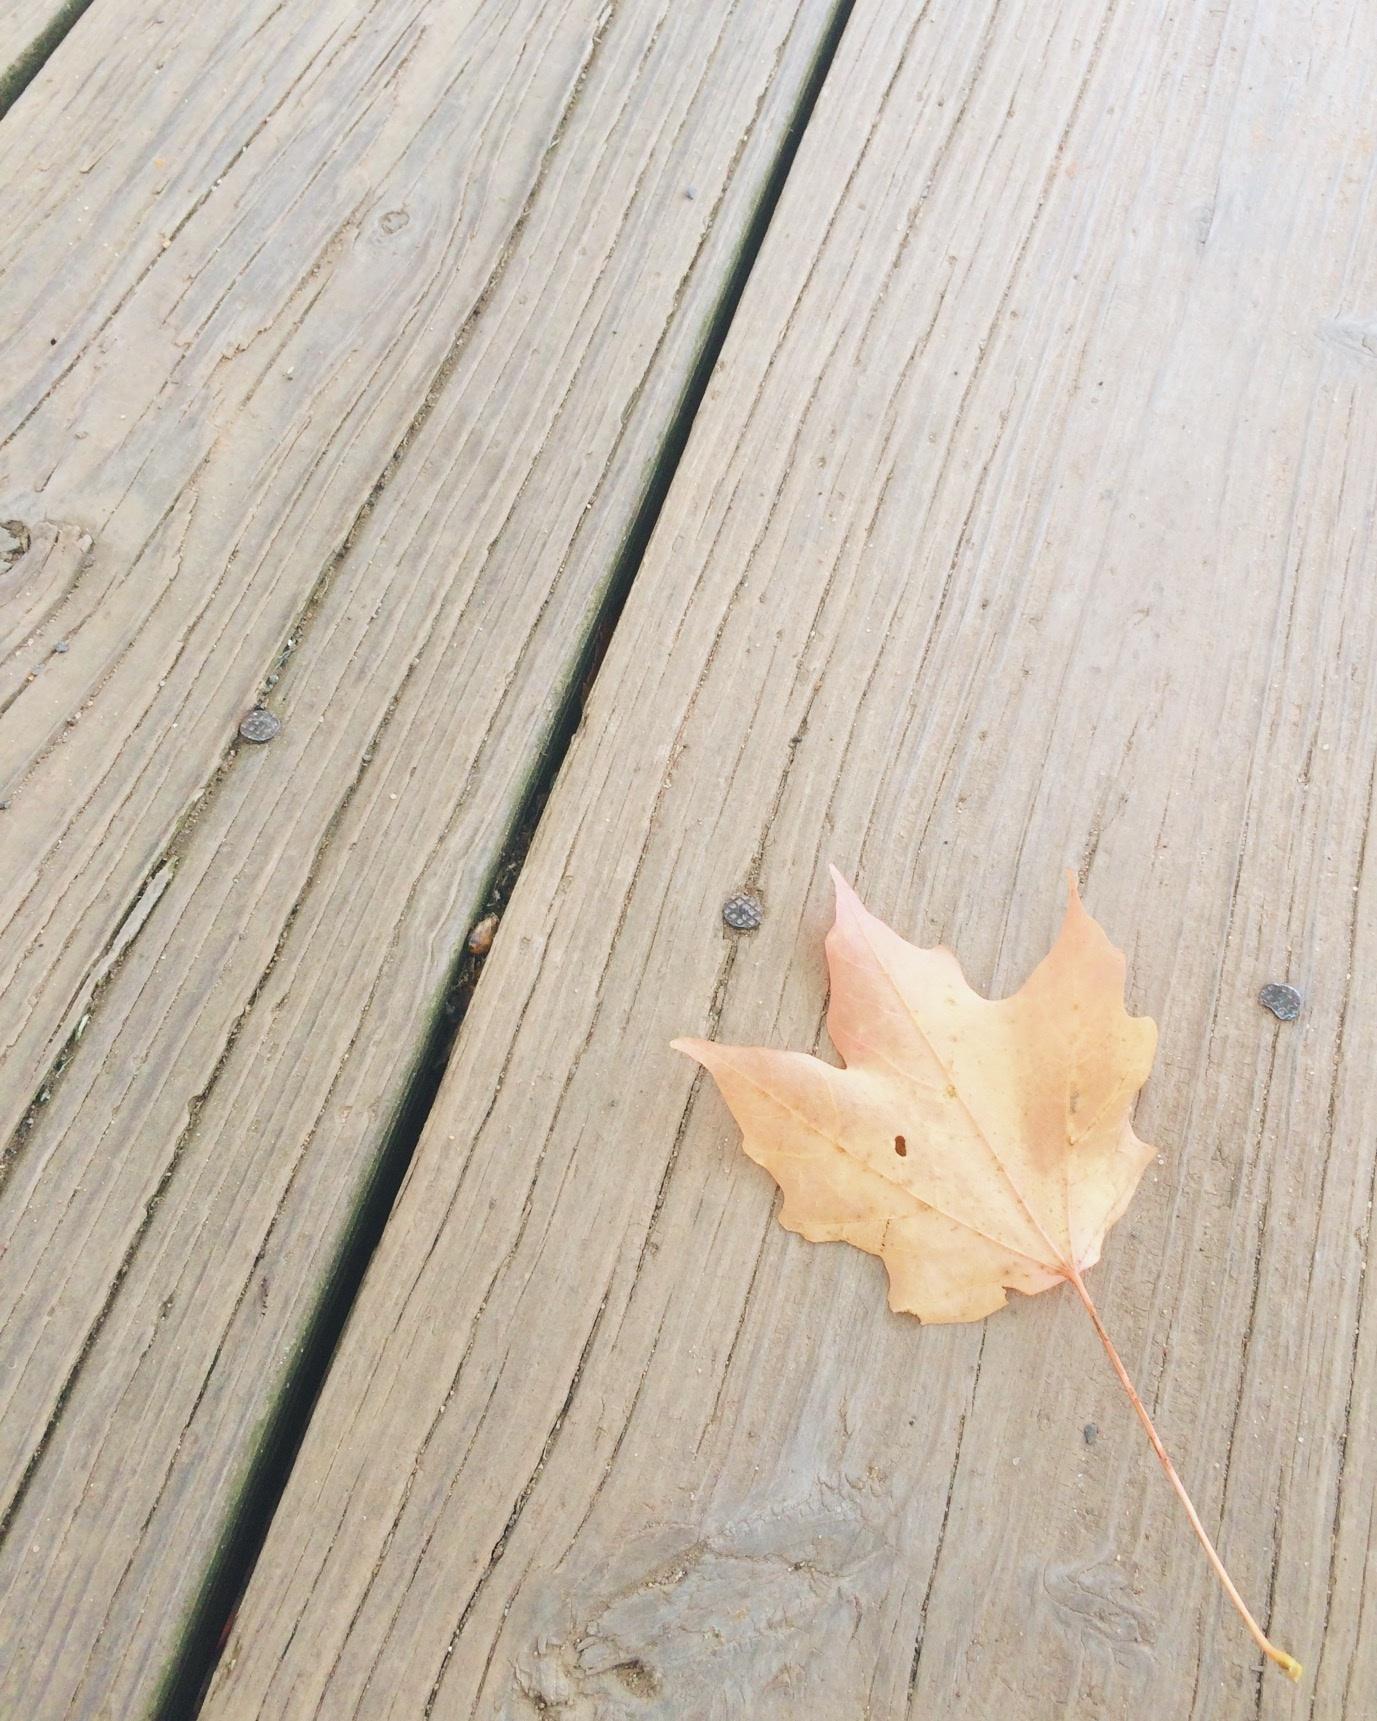 Flügel Holz Blatt Stock Hartholz Bodenbelag Sperrholz Holzboden Laminatboden